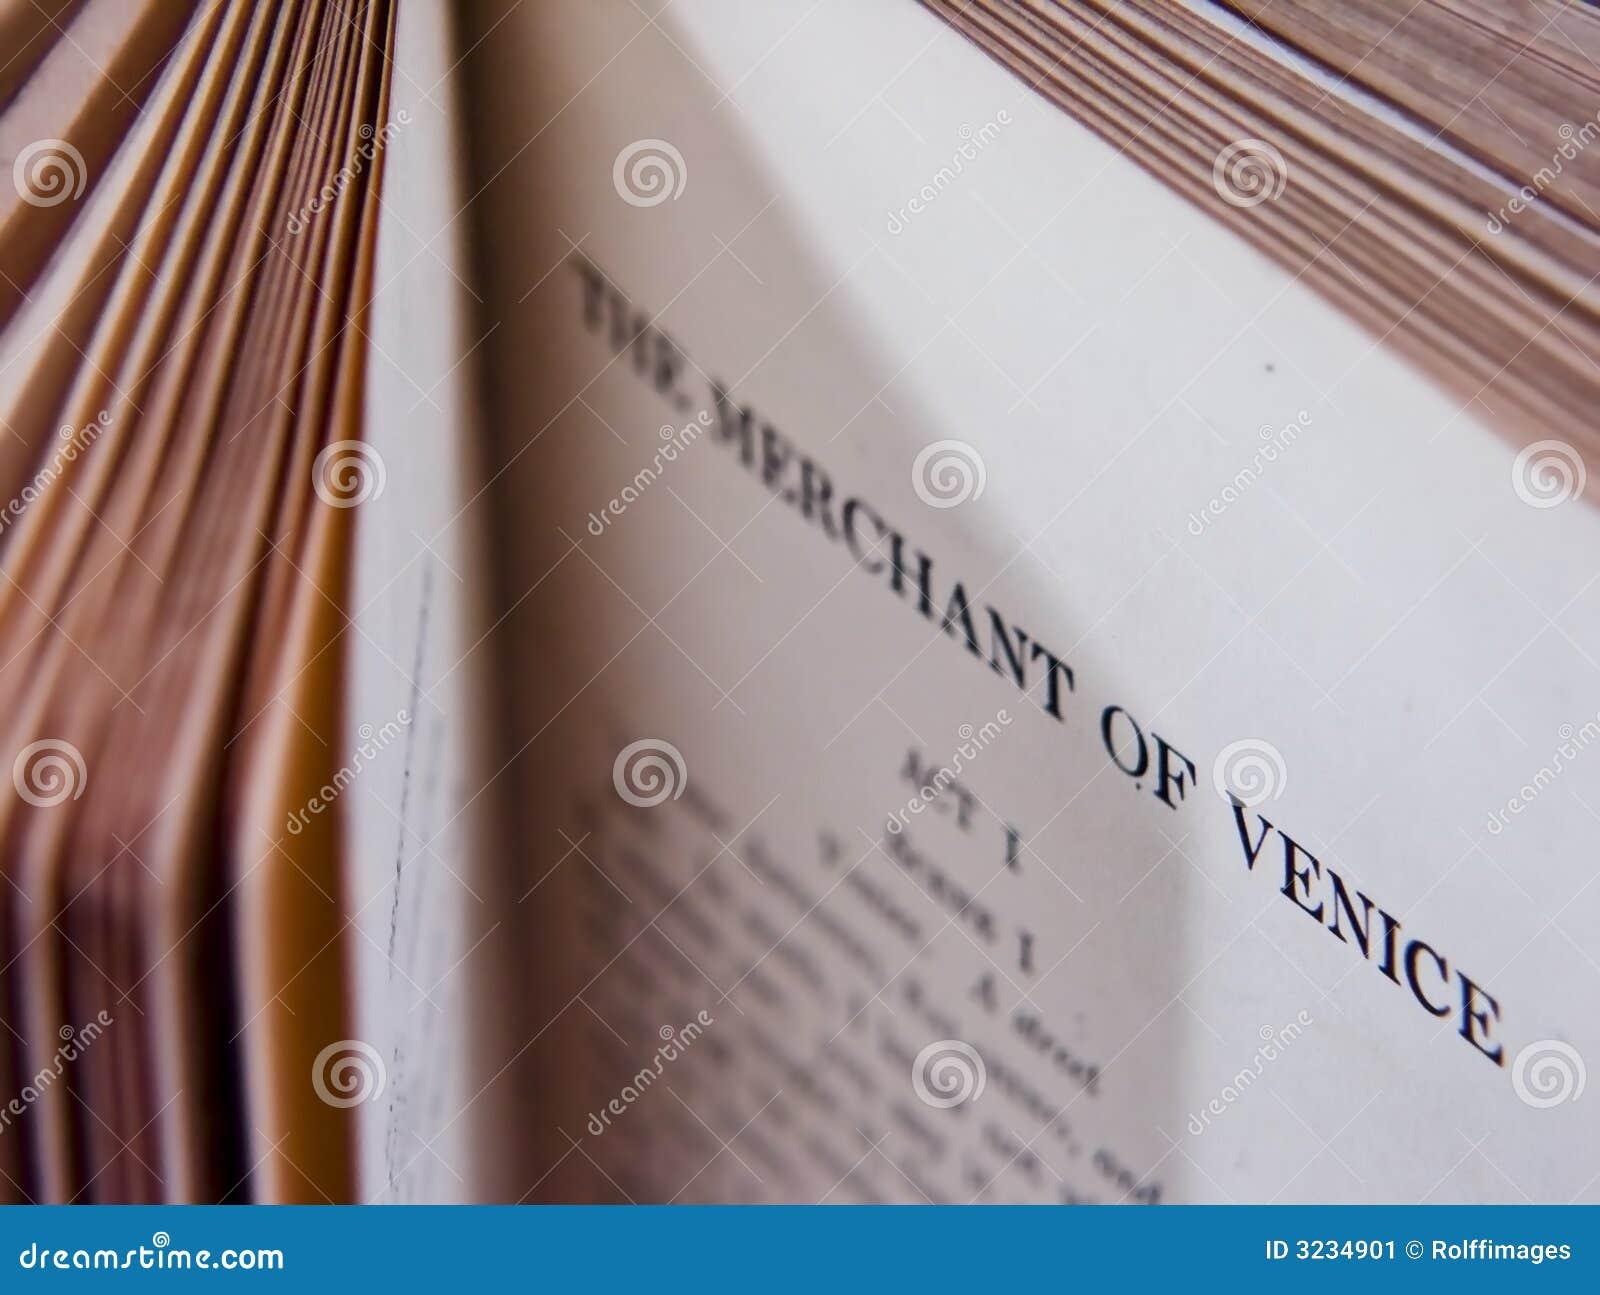 Handelaar van Venetië